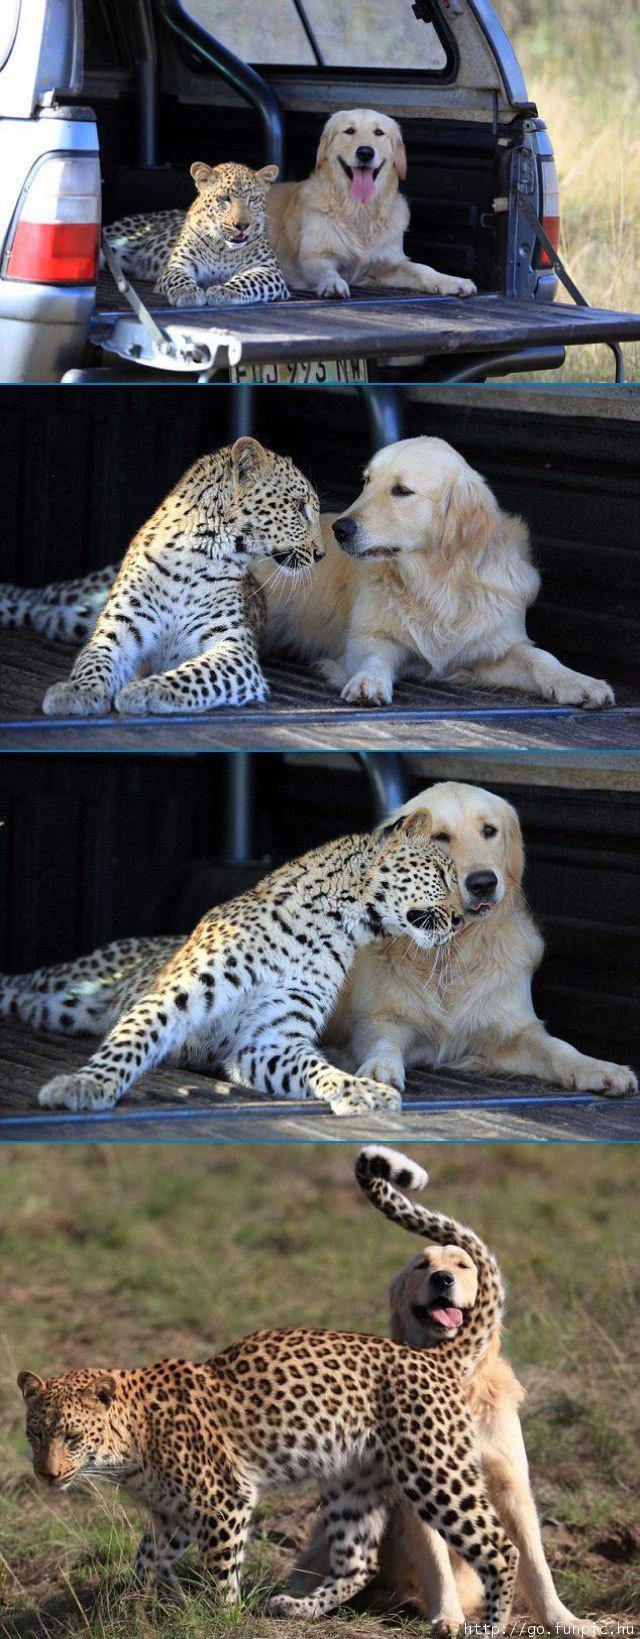 friends-cheetah-labrador-dog